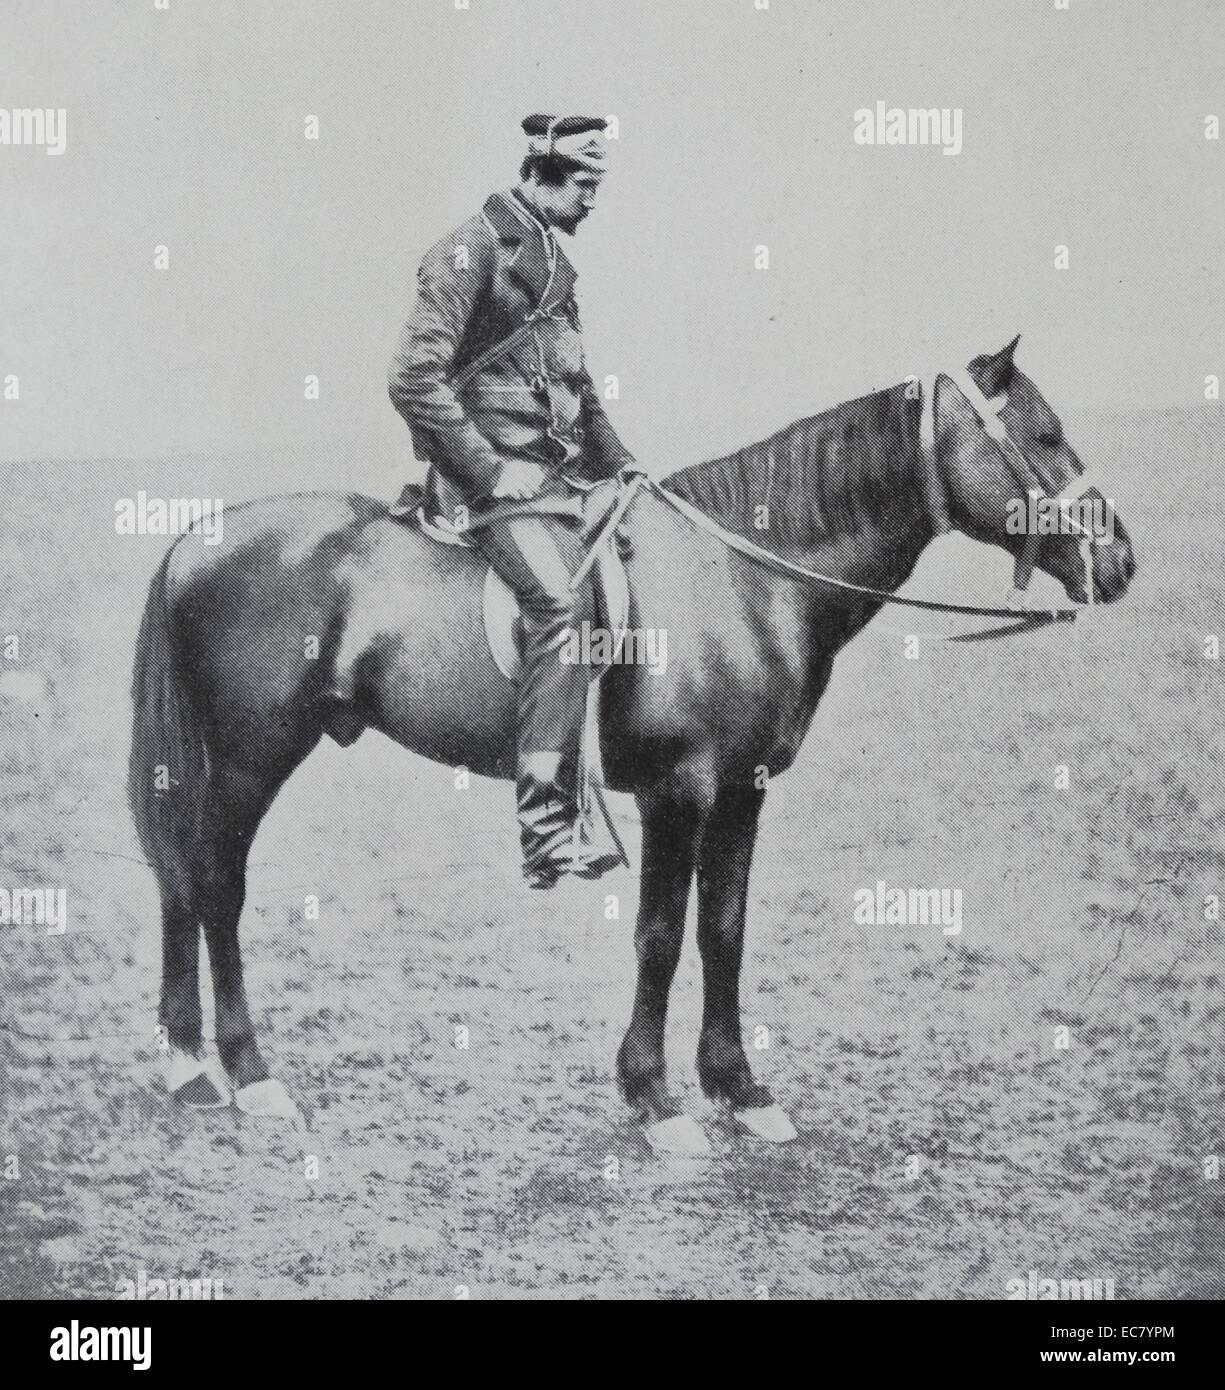 General The Honourable Sir George Cathcart GCB (12 May 1794 – 5 November 1854) was a British general and diplomat. Stock Photo